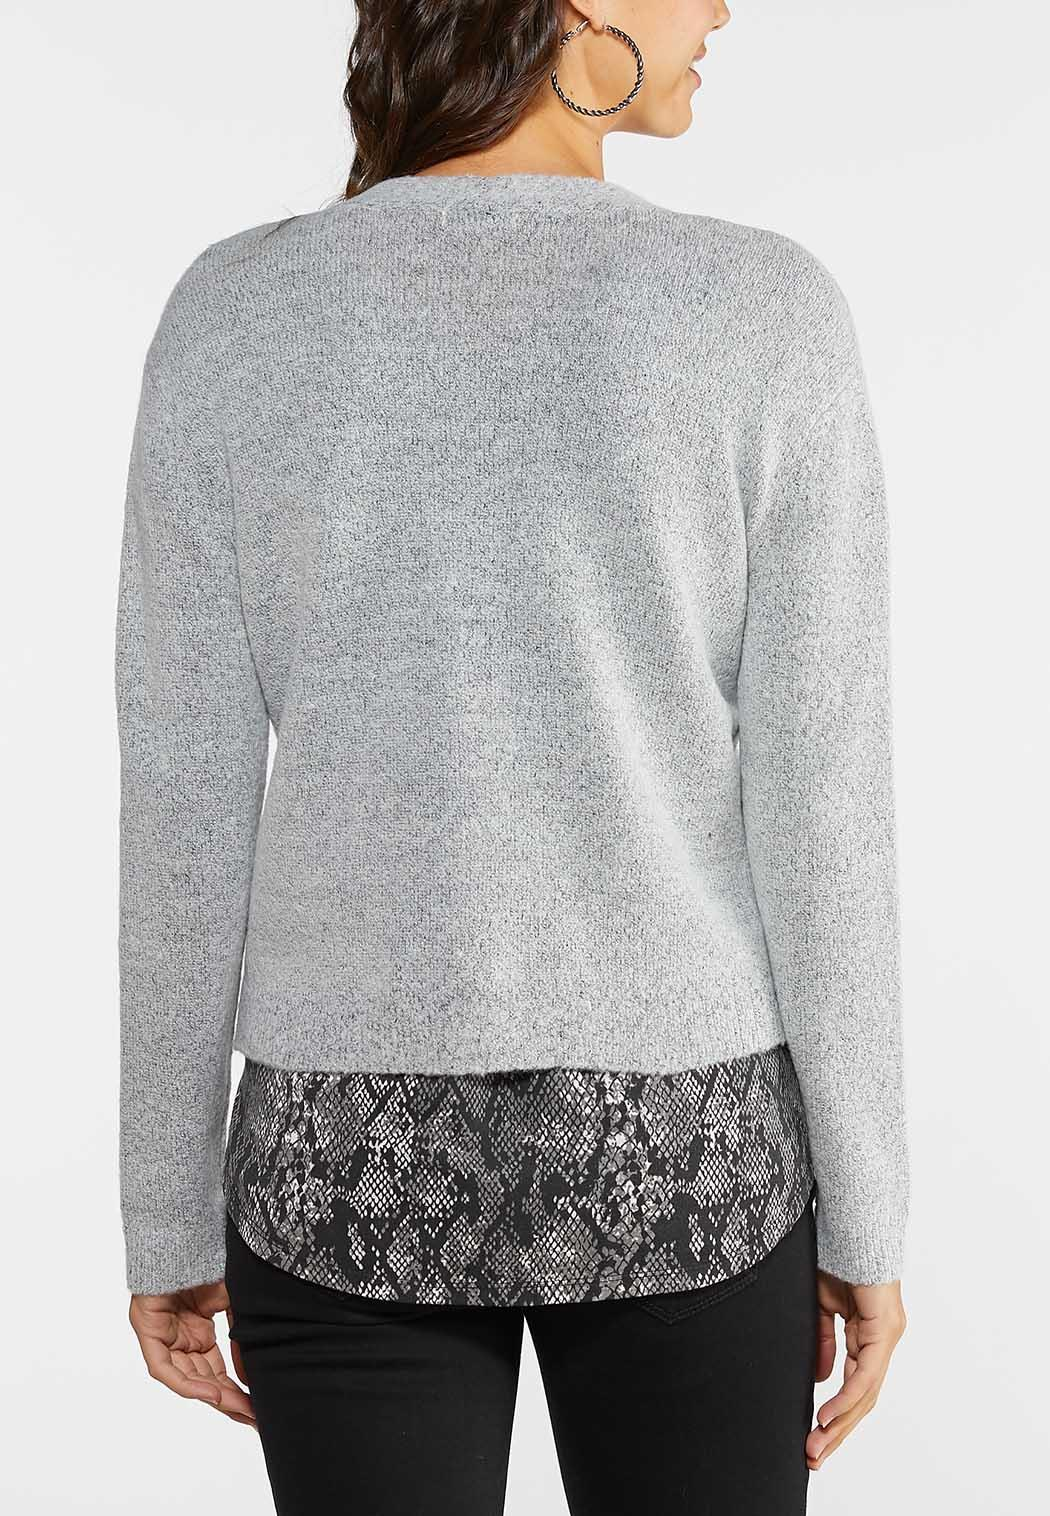 Skimmer Cardigan Sweater (Item #44067247)